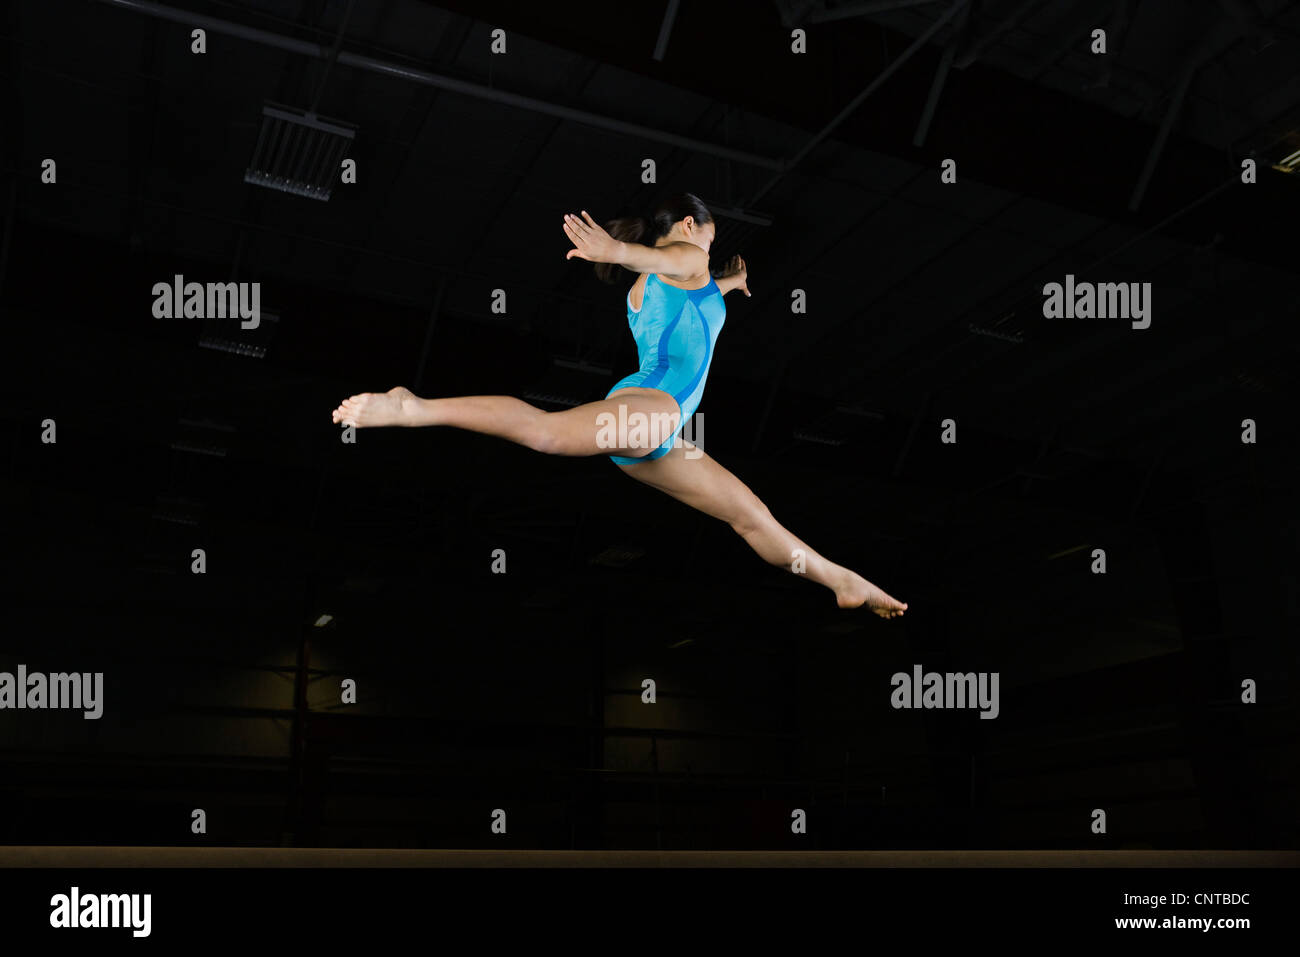 Teenage girl gymnast performing split leap, low angle view - Stock Image